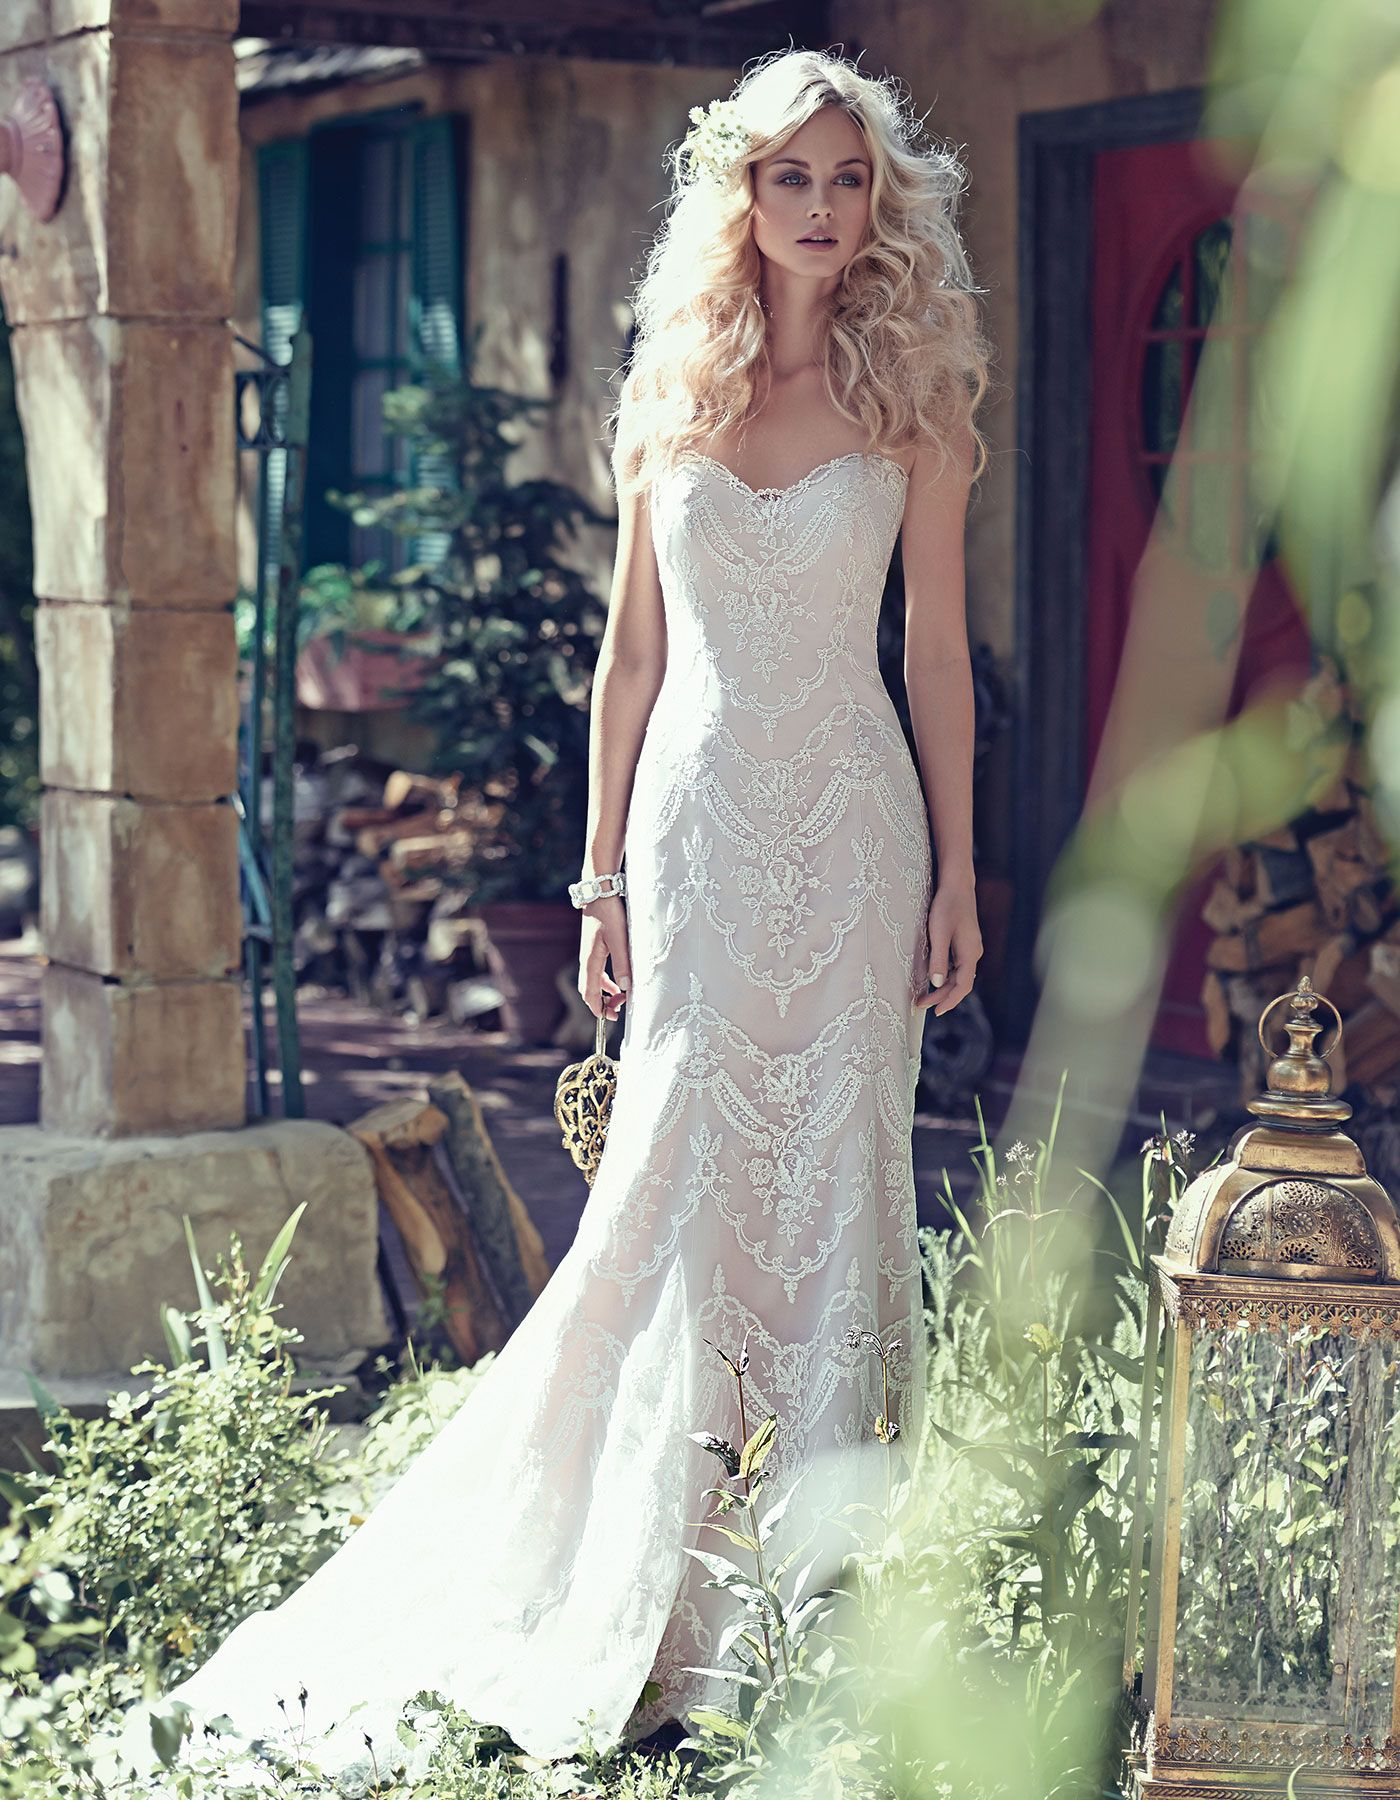 Vintage lace strapless wedding gown kirstie maggie sottero